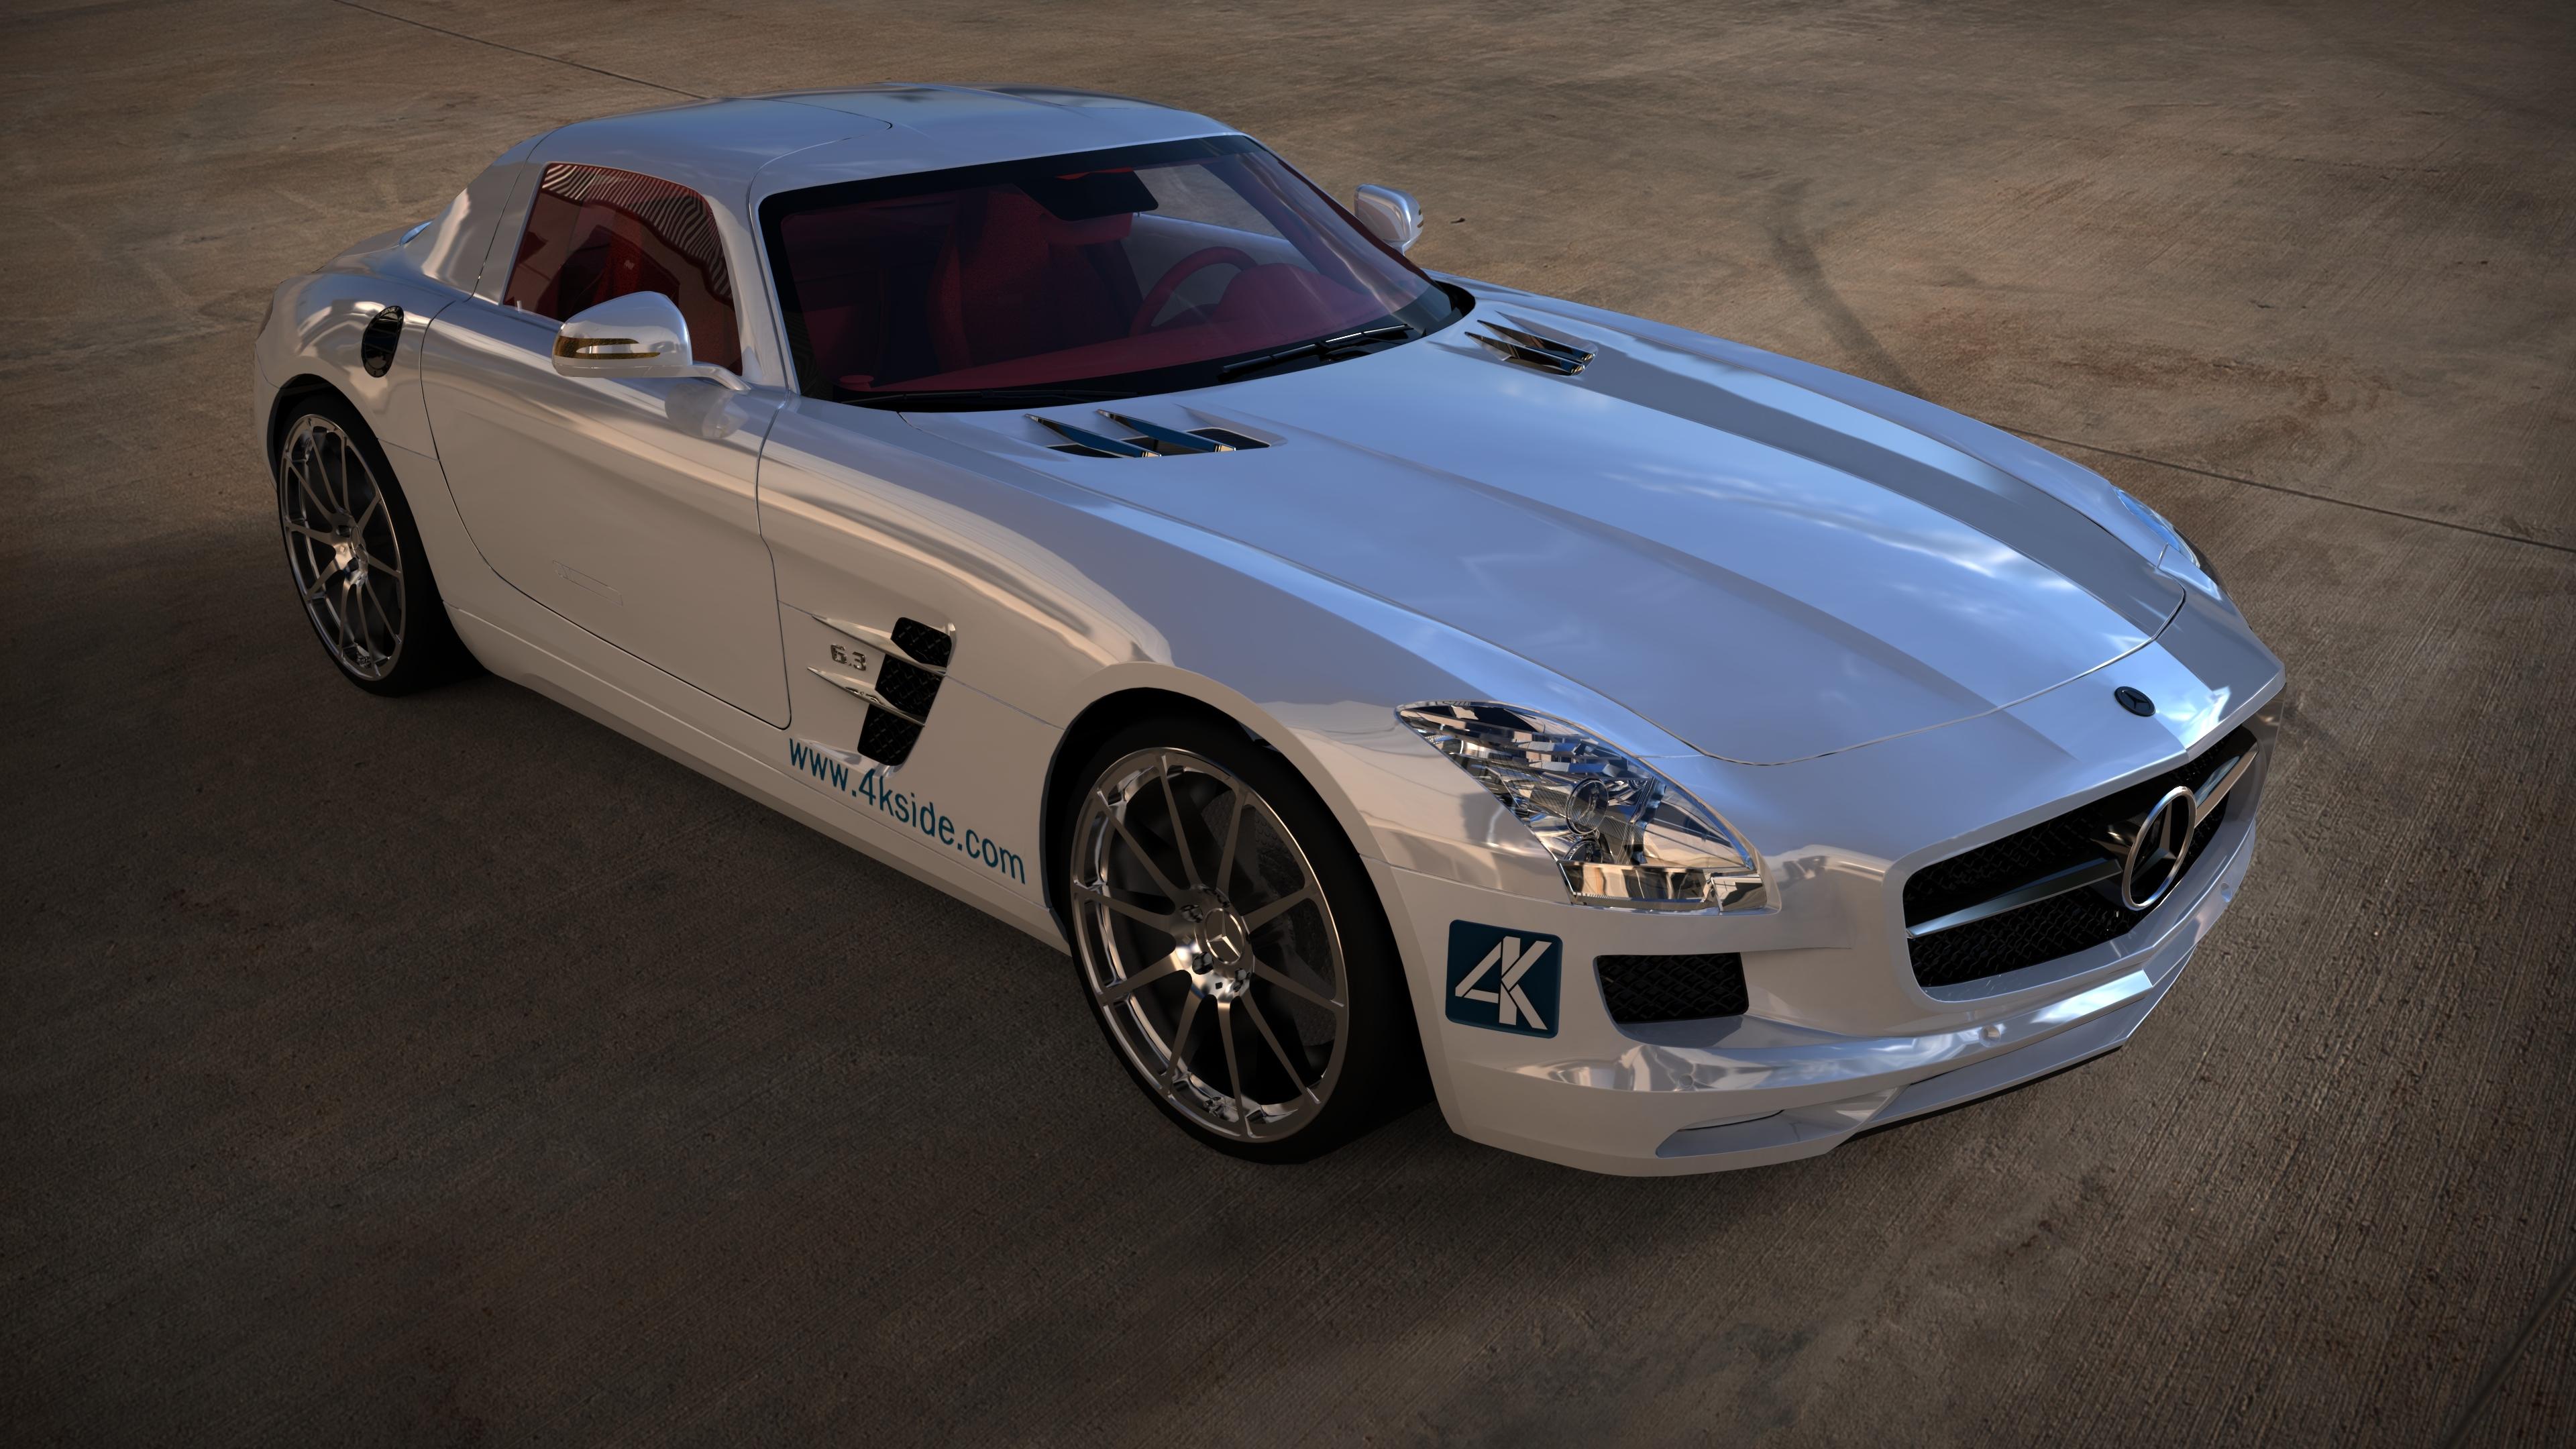 4K Wallpaper  Mercedes SLS AMG Desktop Backgrounds 3840x2160